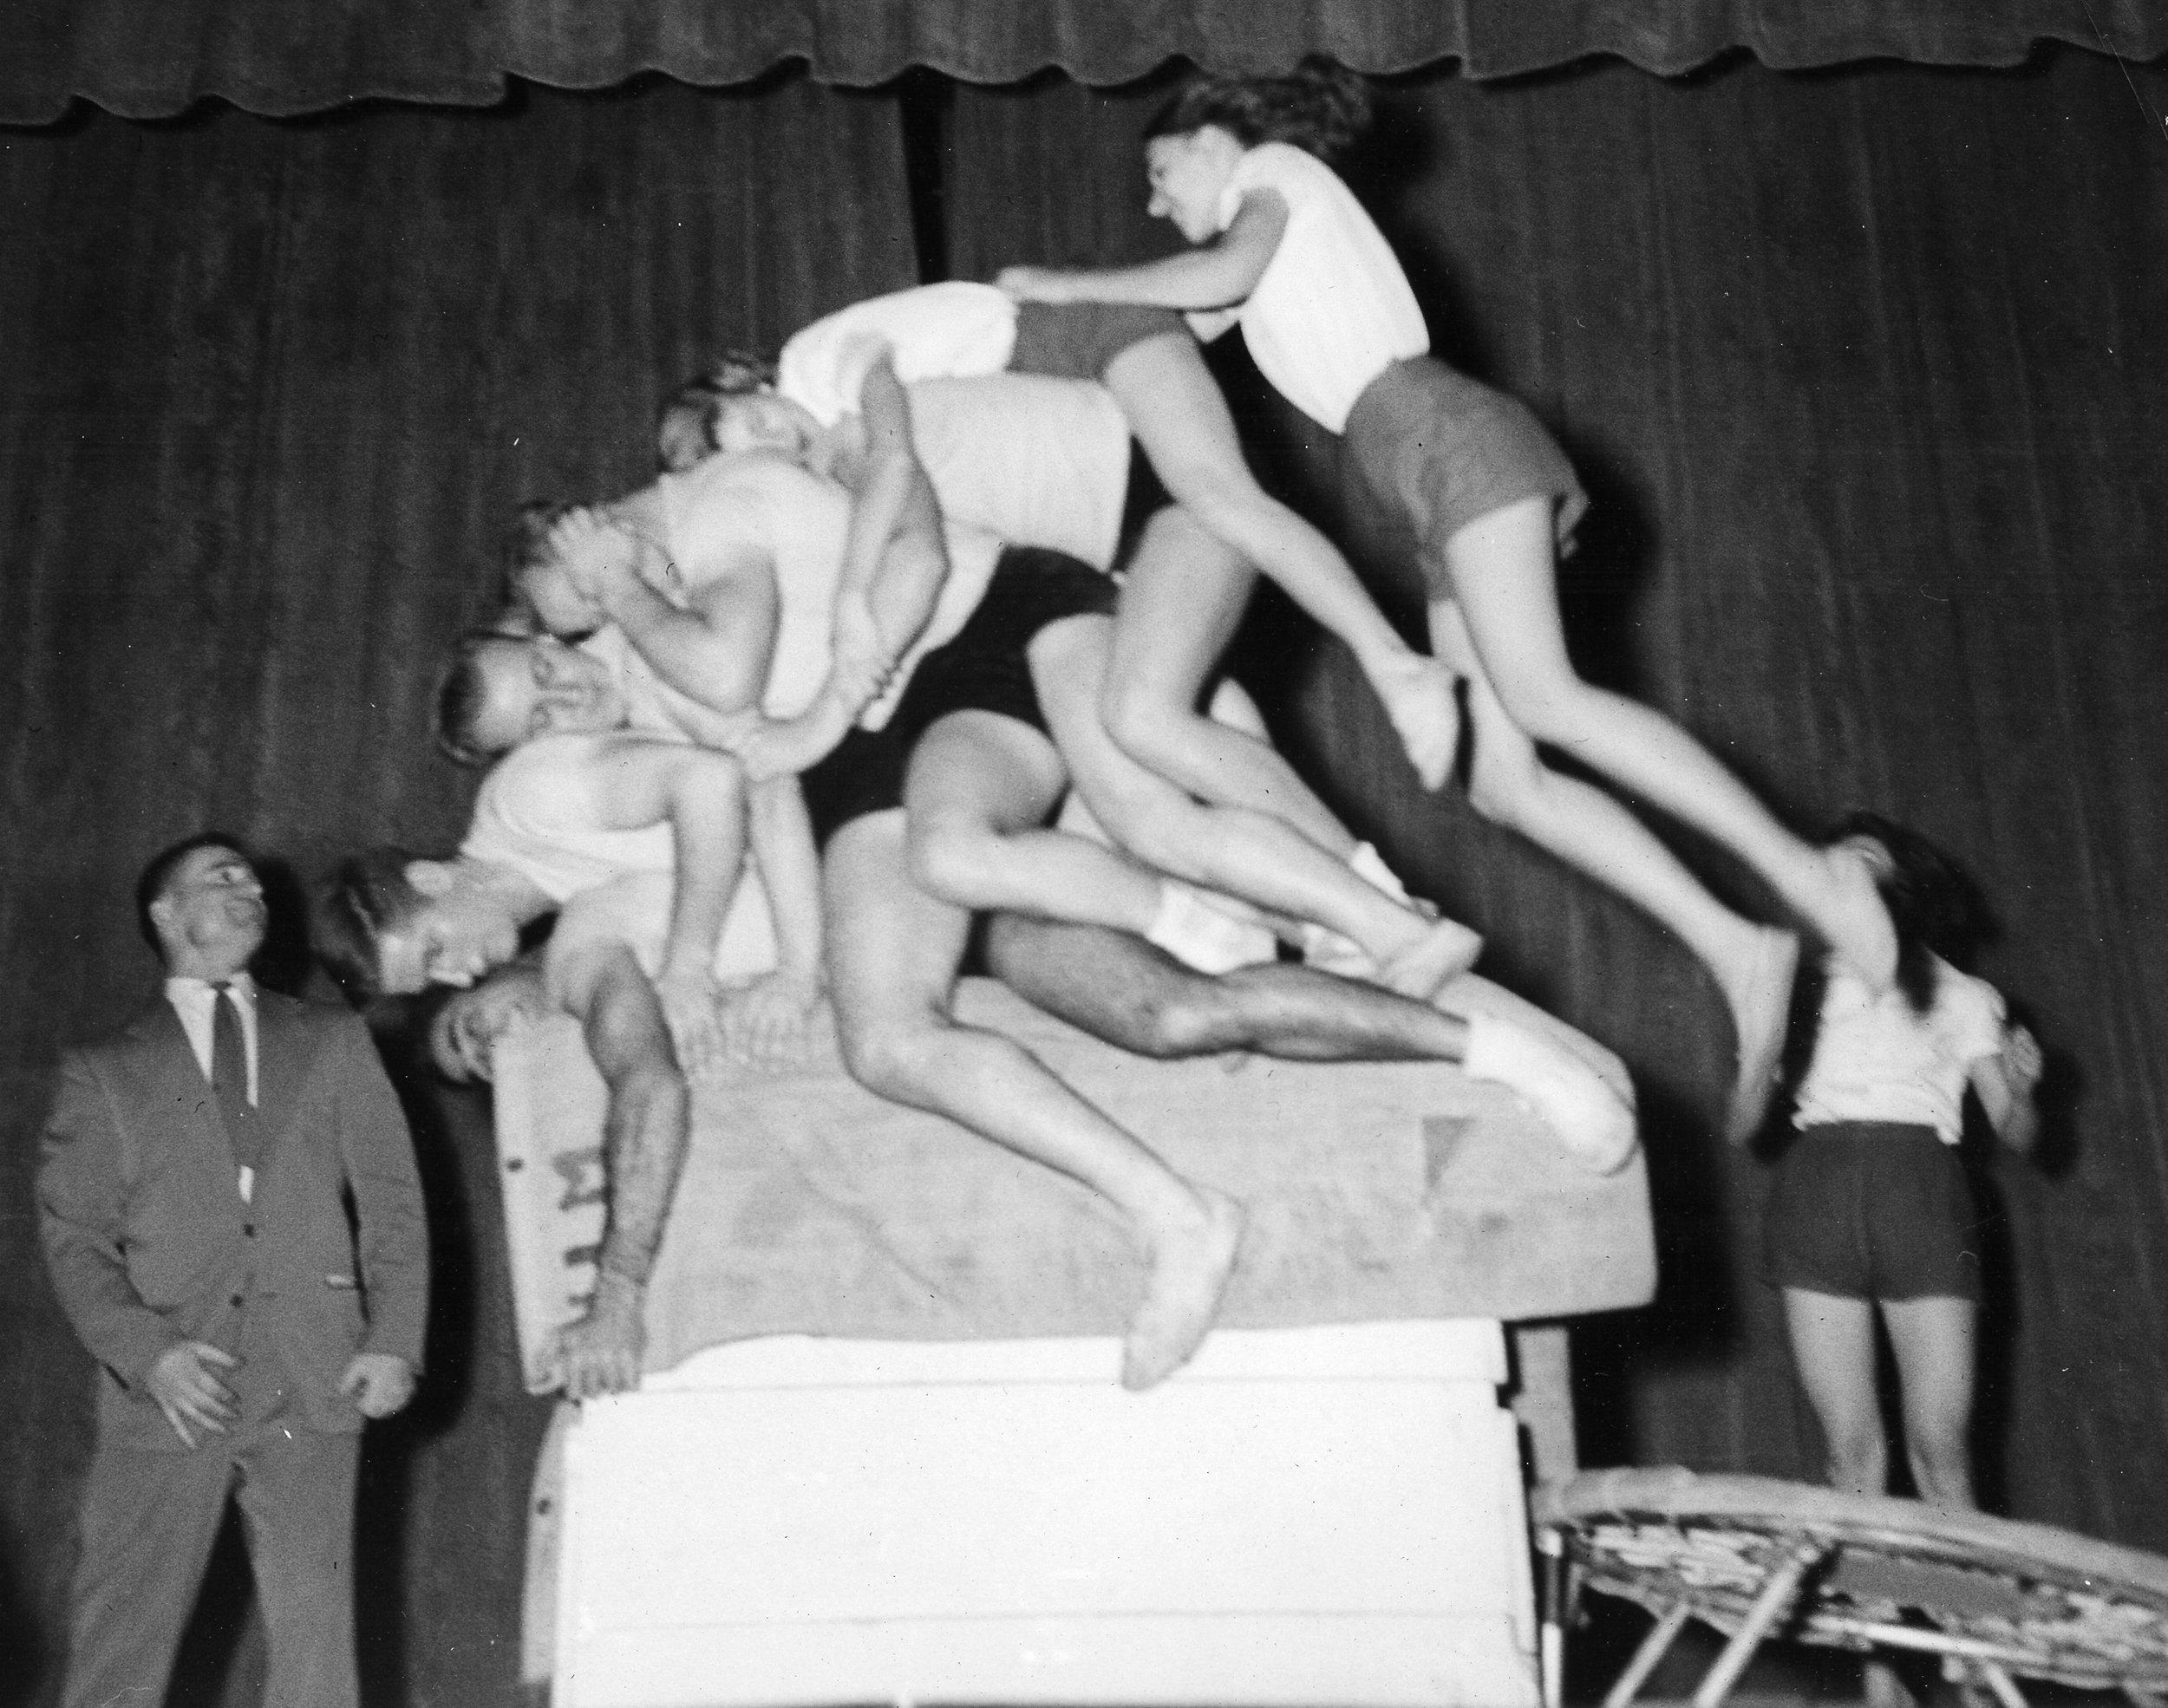 Vaulting 1953